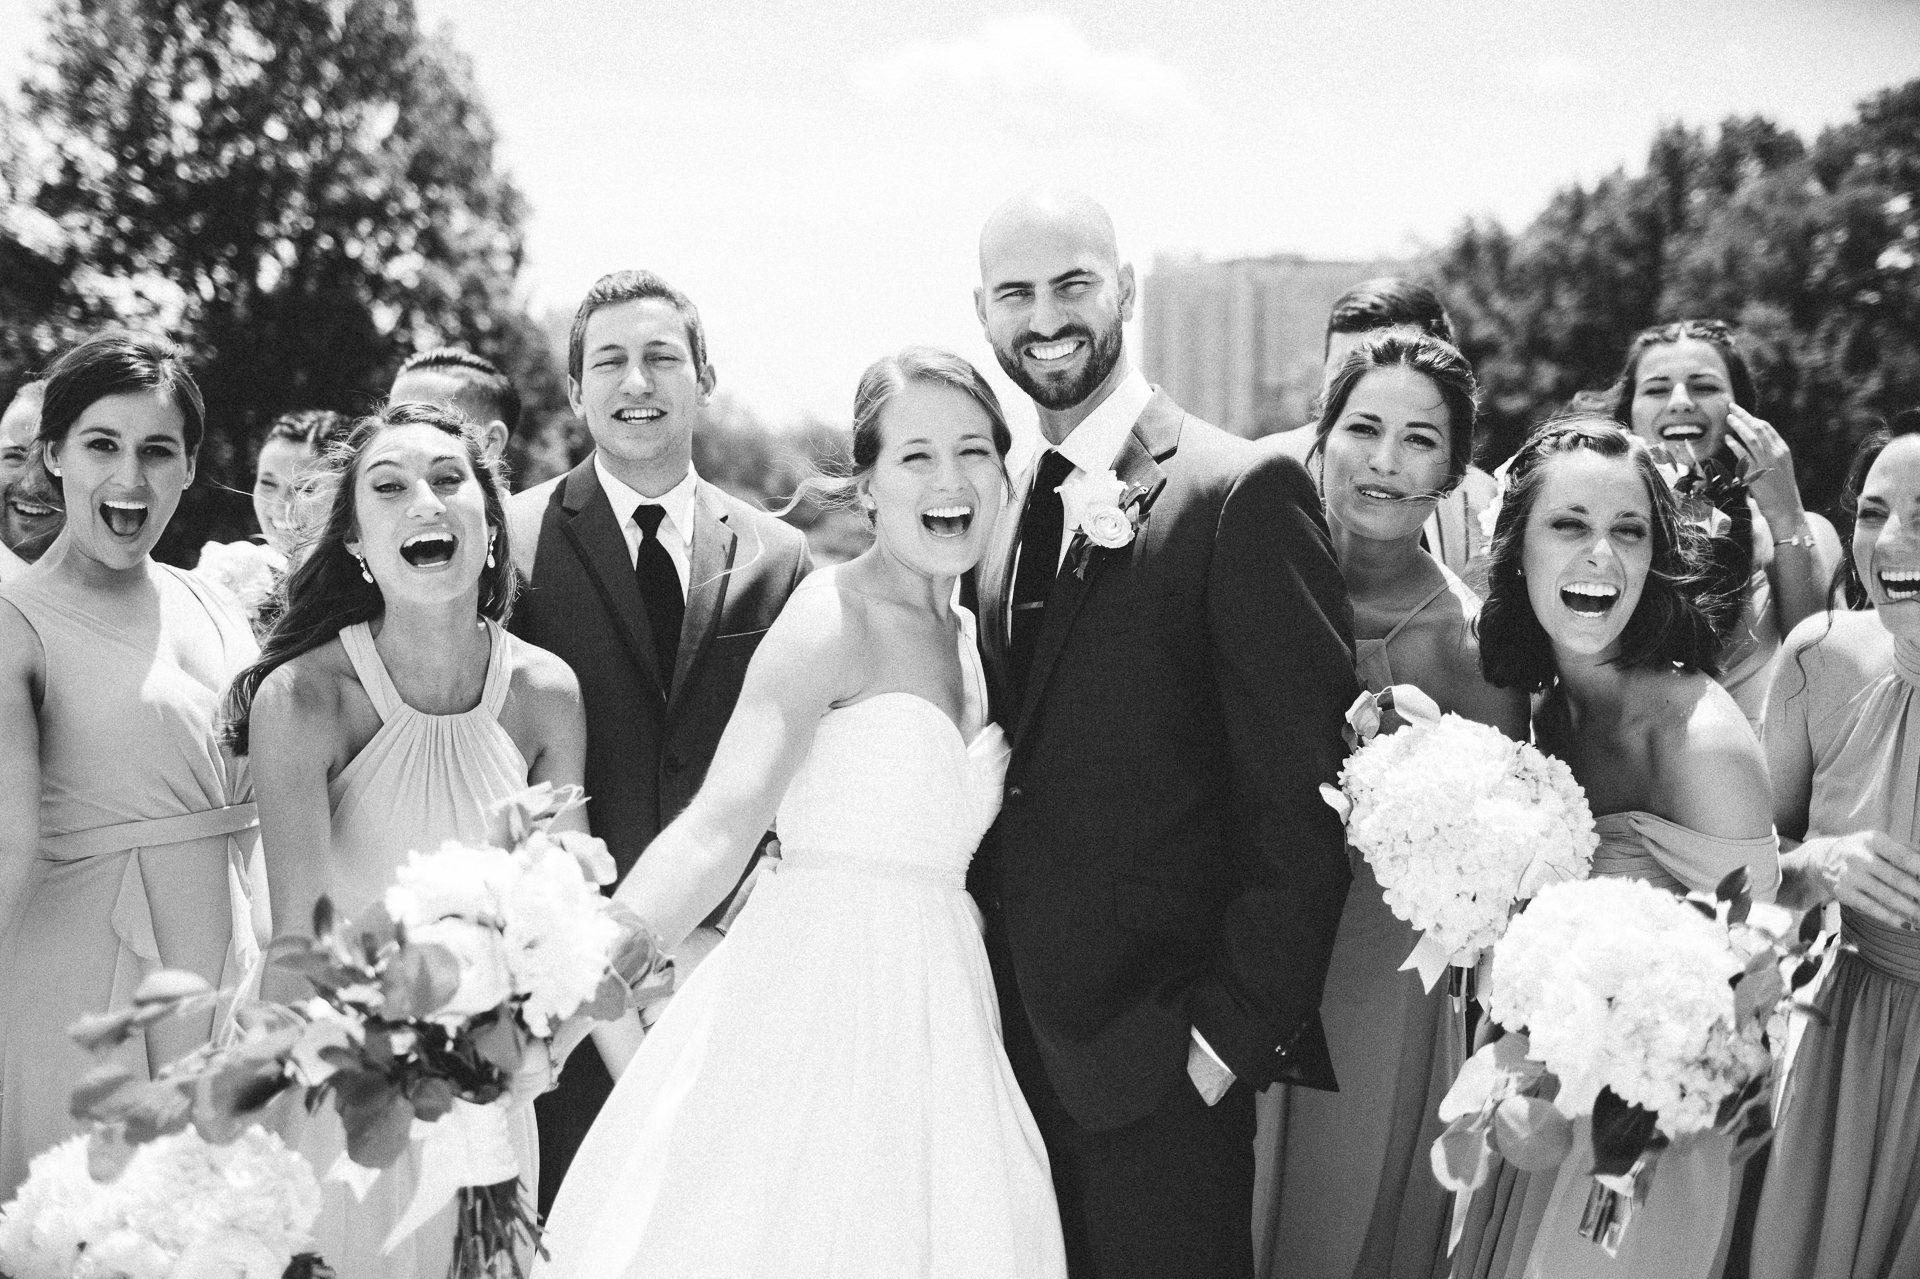 Dowtown Hilton Cleveland Wedding Photographer 1 36.jpg